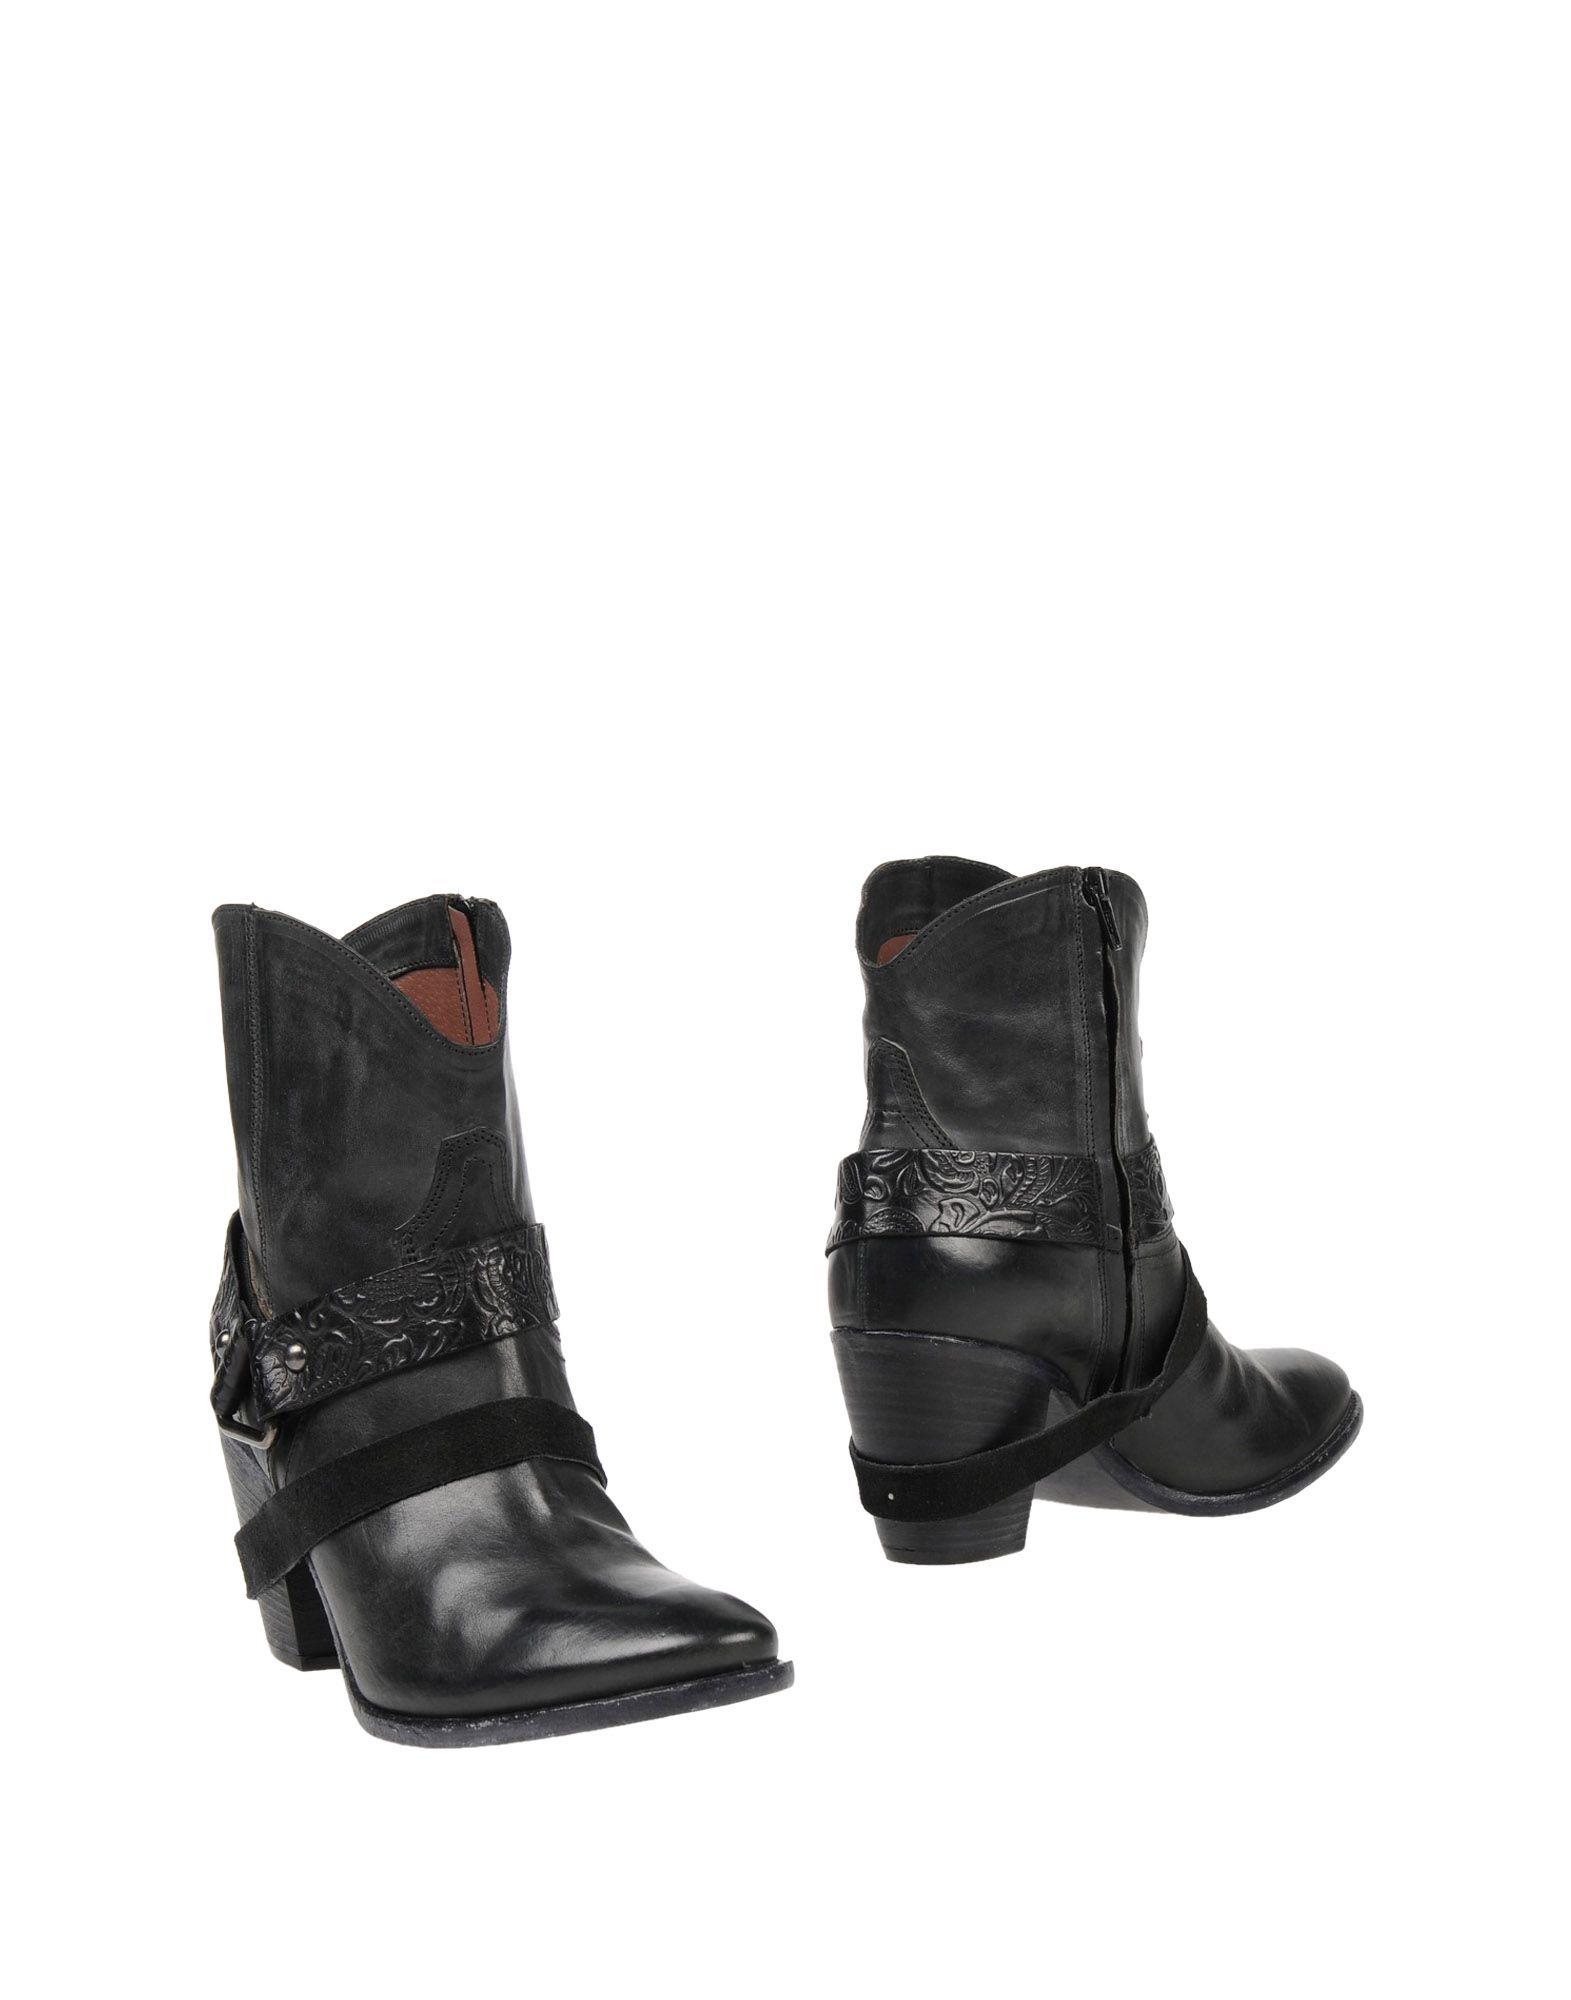 GUESS Полусапоги и высокие ботинки полусапоги guess flril4 lea10 blkdb